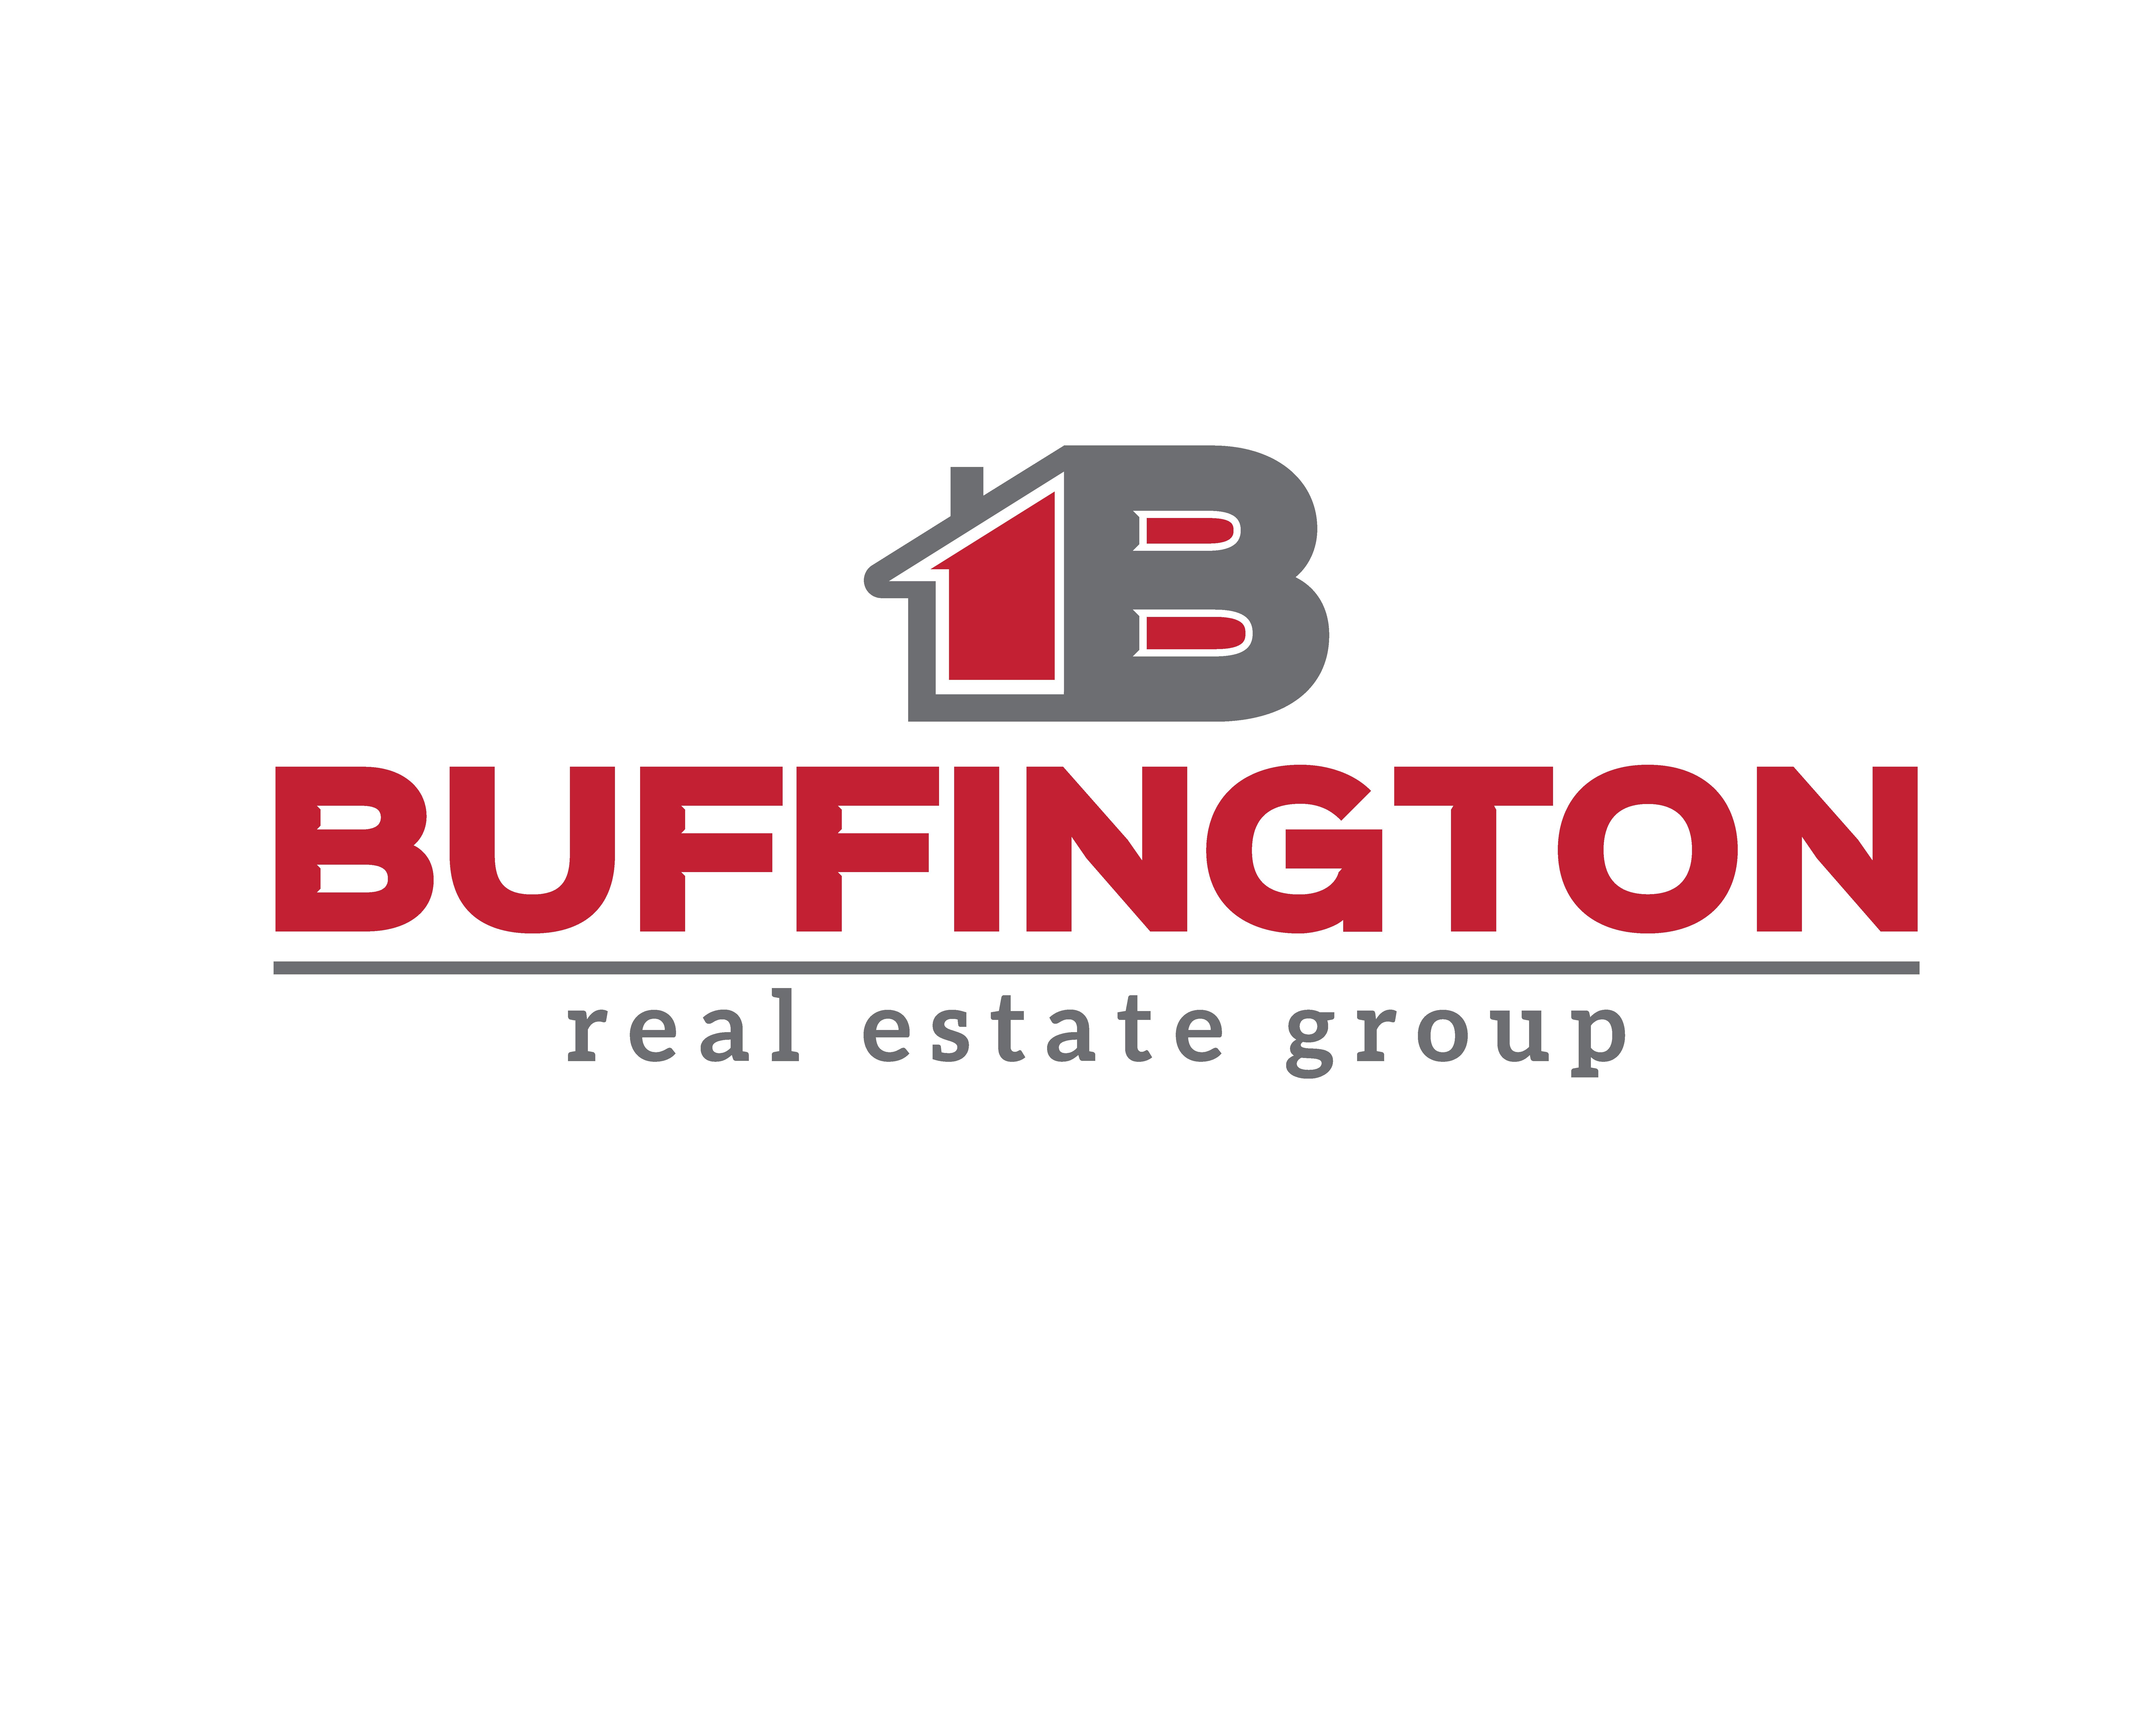 Buffington Real Estate Group logo